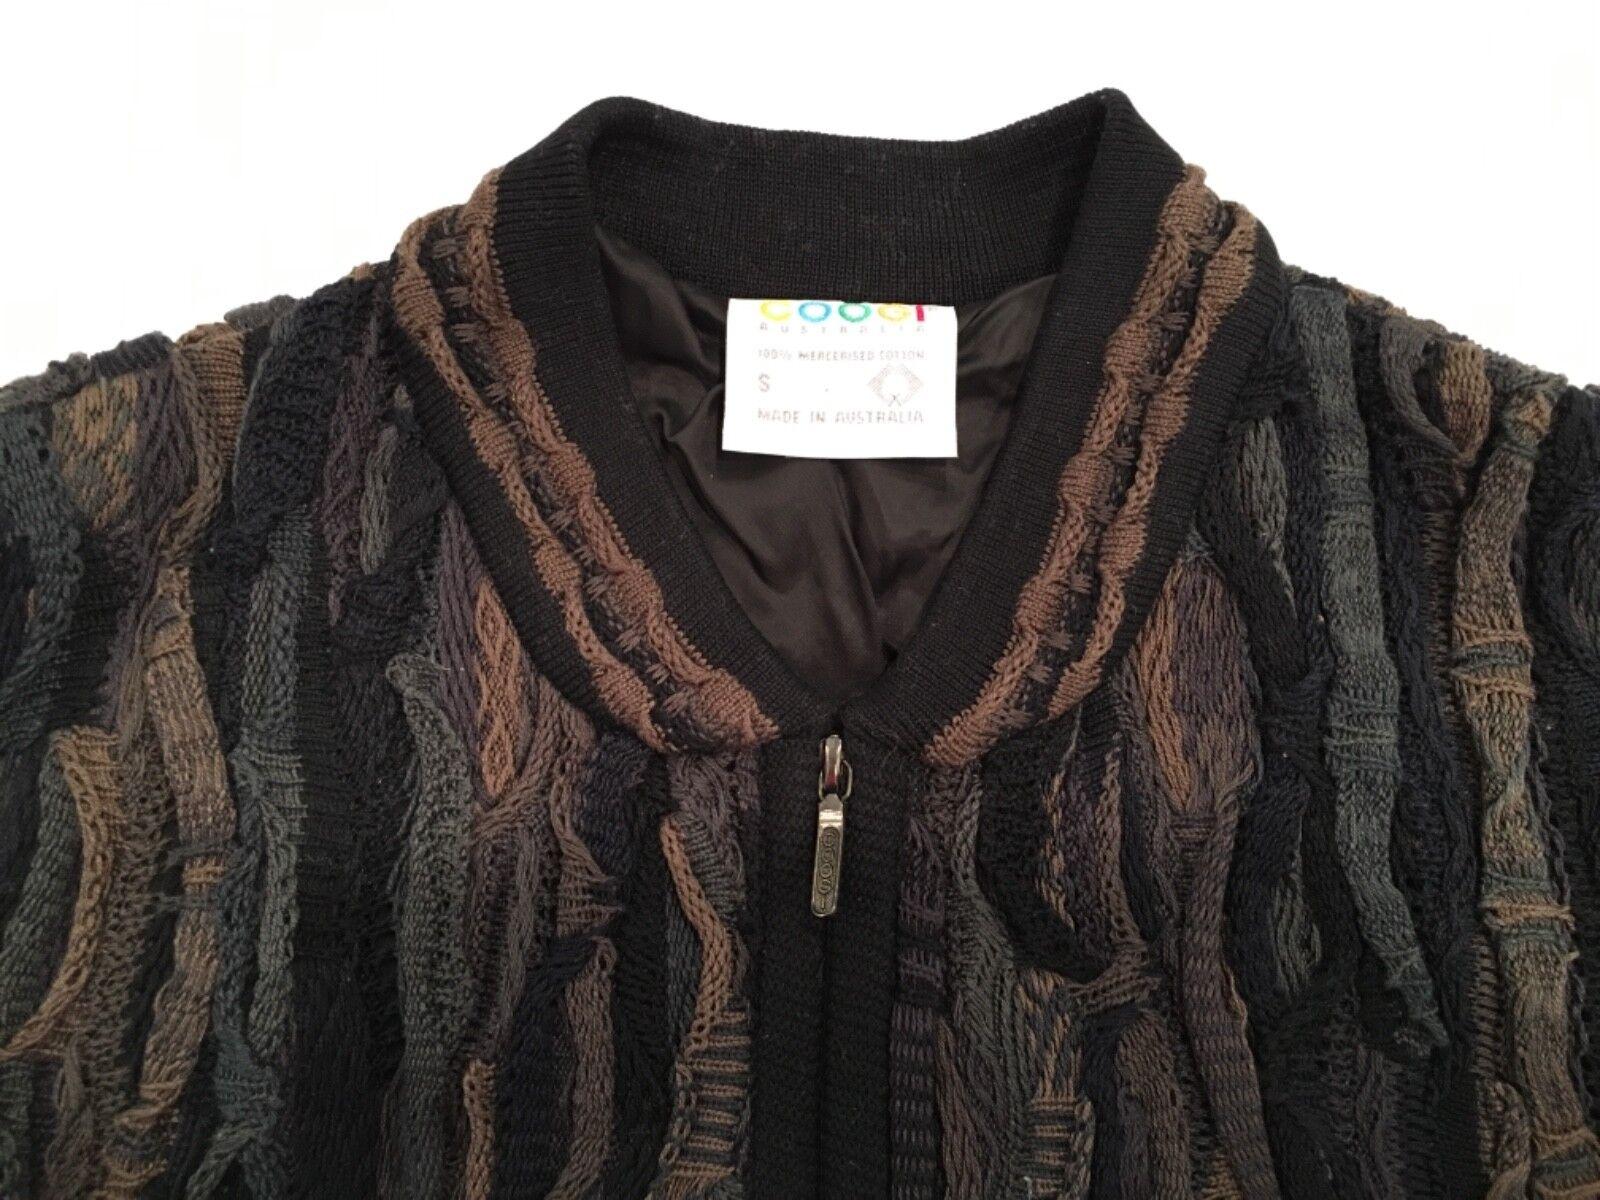 Coogi - S - Vintage Front Zip Sweater Jacket 100% Cotton